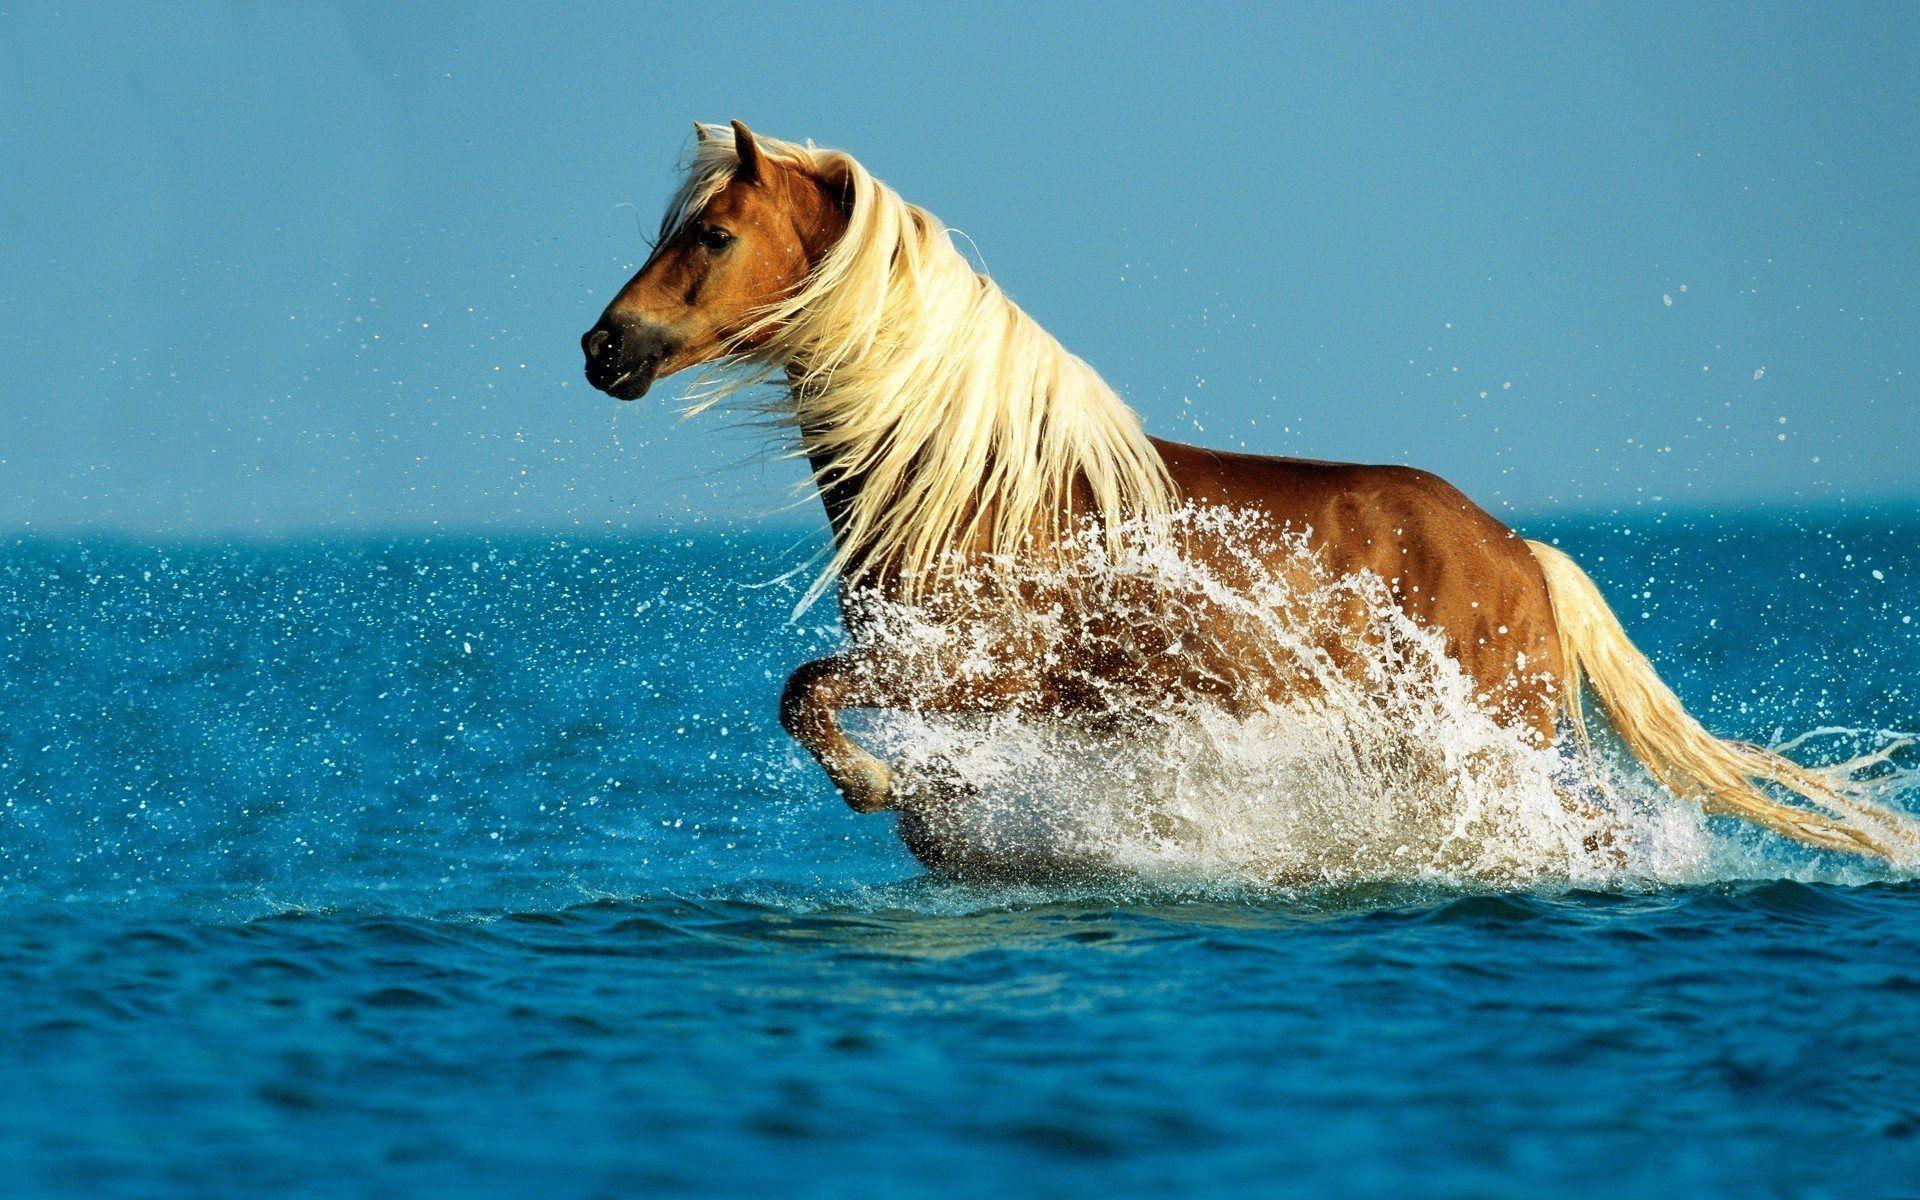 Good Wallpaper Horse Ocean - 203a9bc85eb2ffde2c740ff1628ad396  You Should Have_569142.jpg